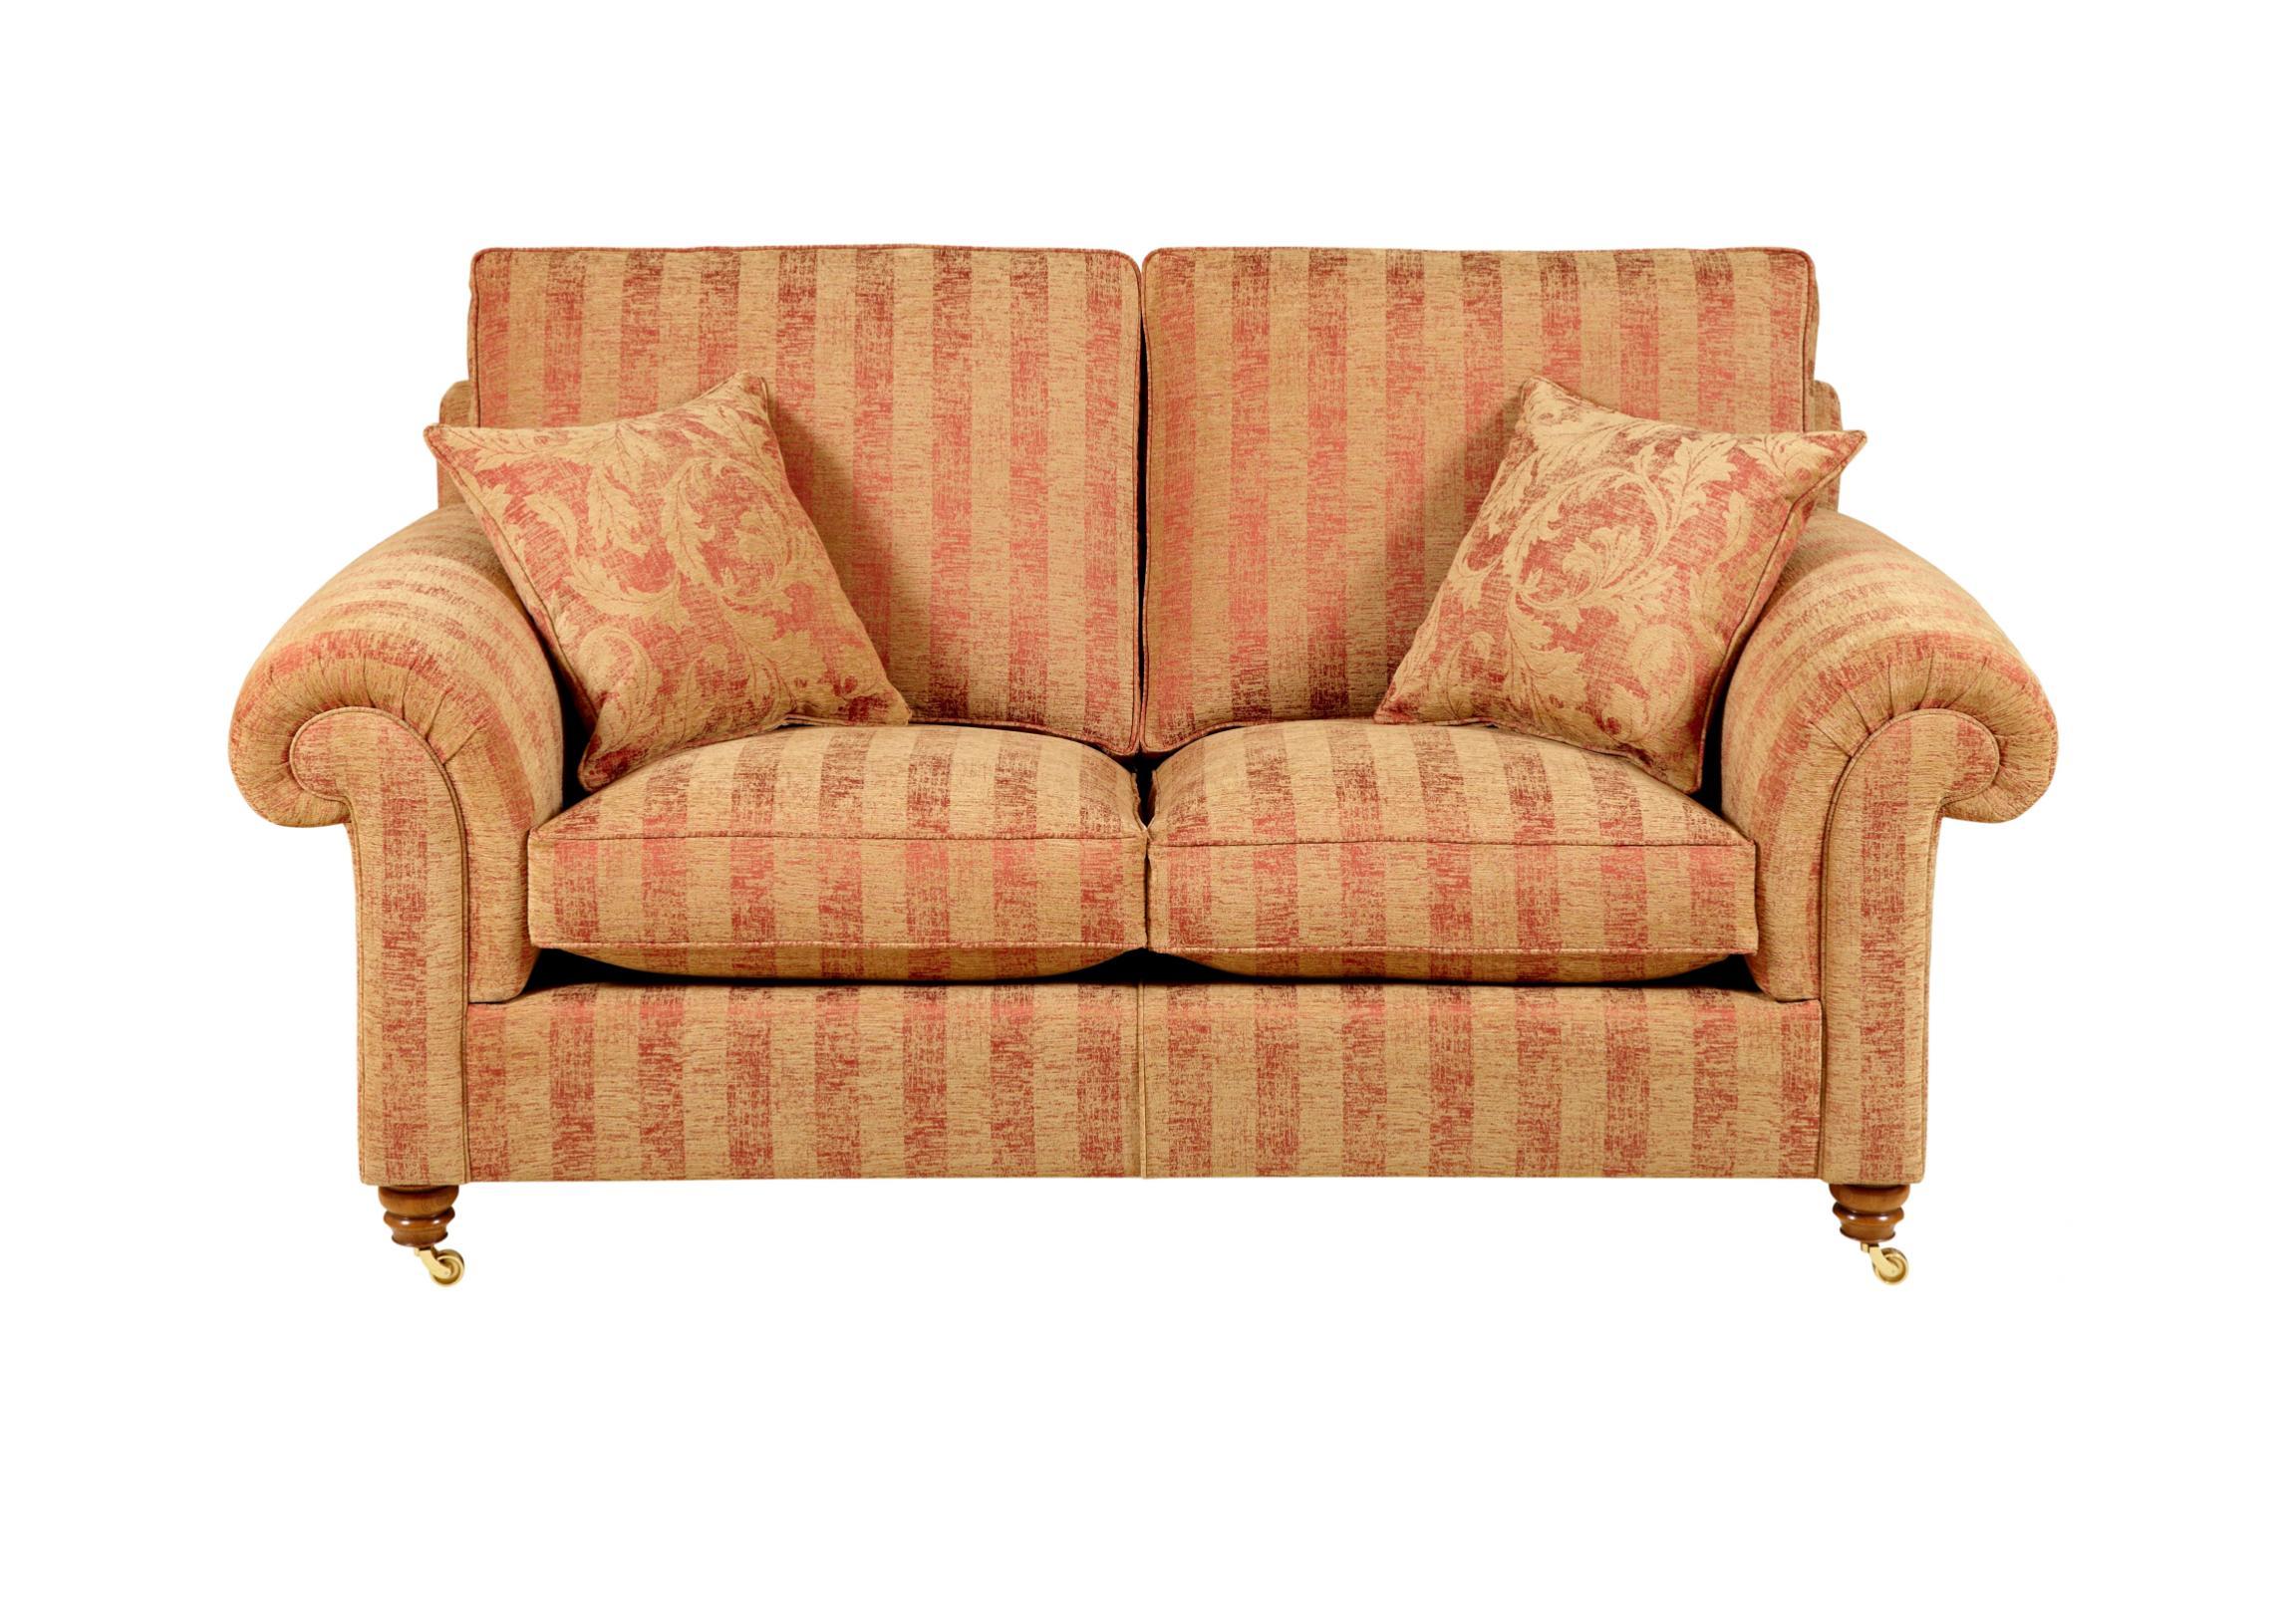 Striped Sofa Furniture Village  Brokeasshomecom